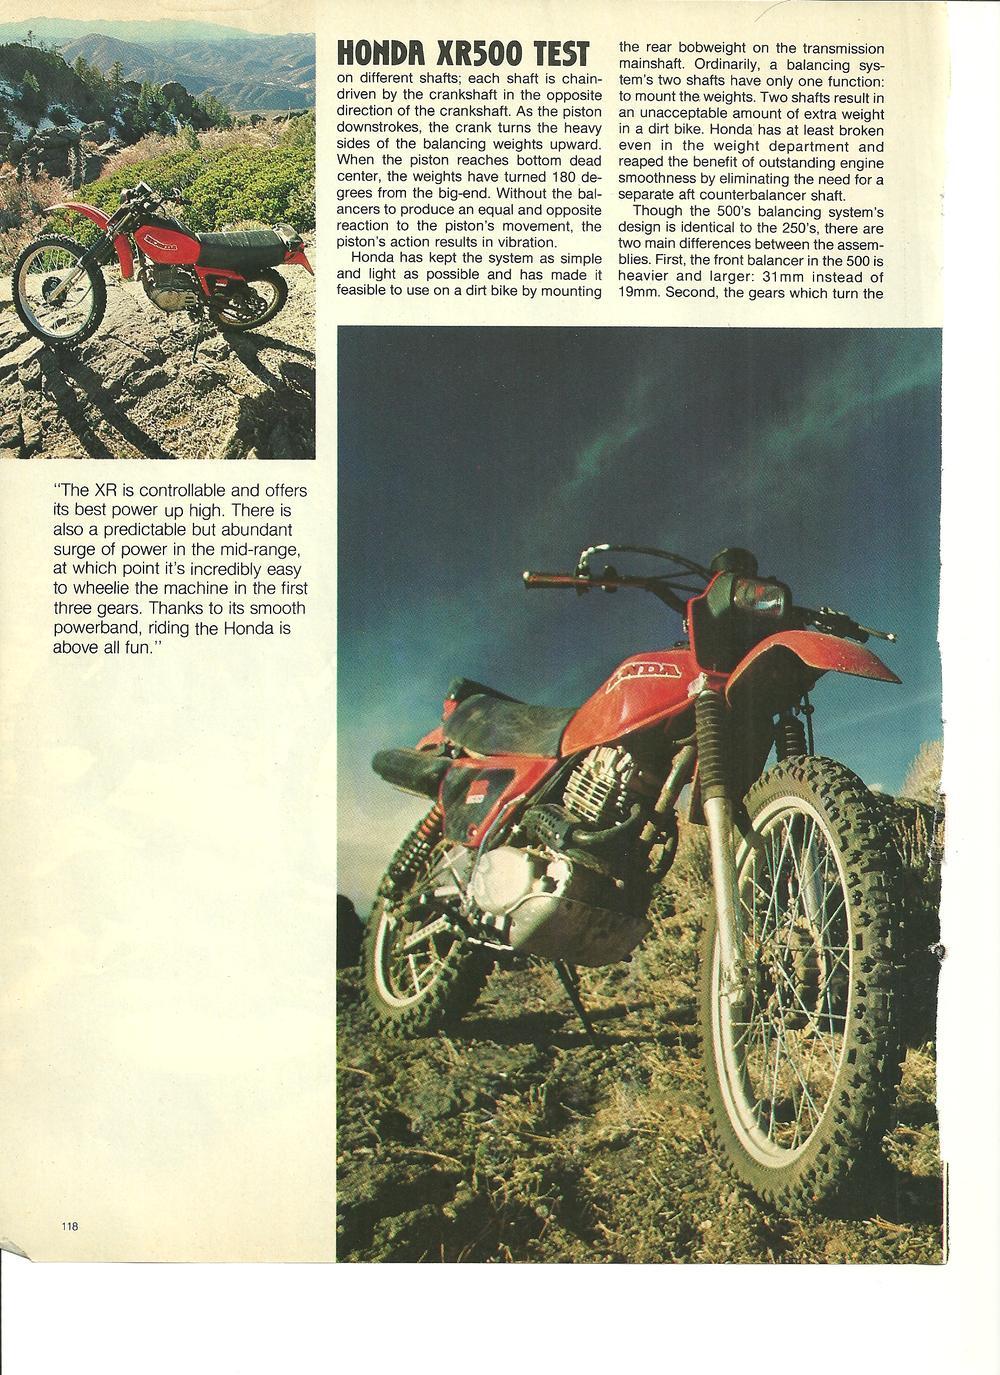 1979_Honda_XR500_test_pg3.png